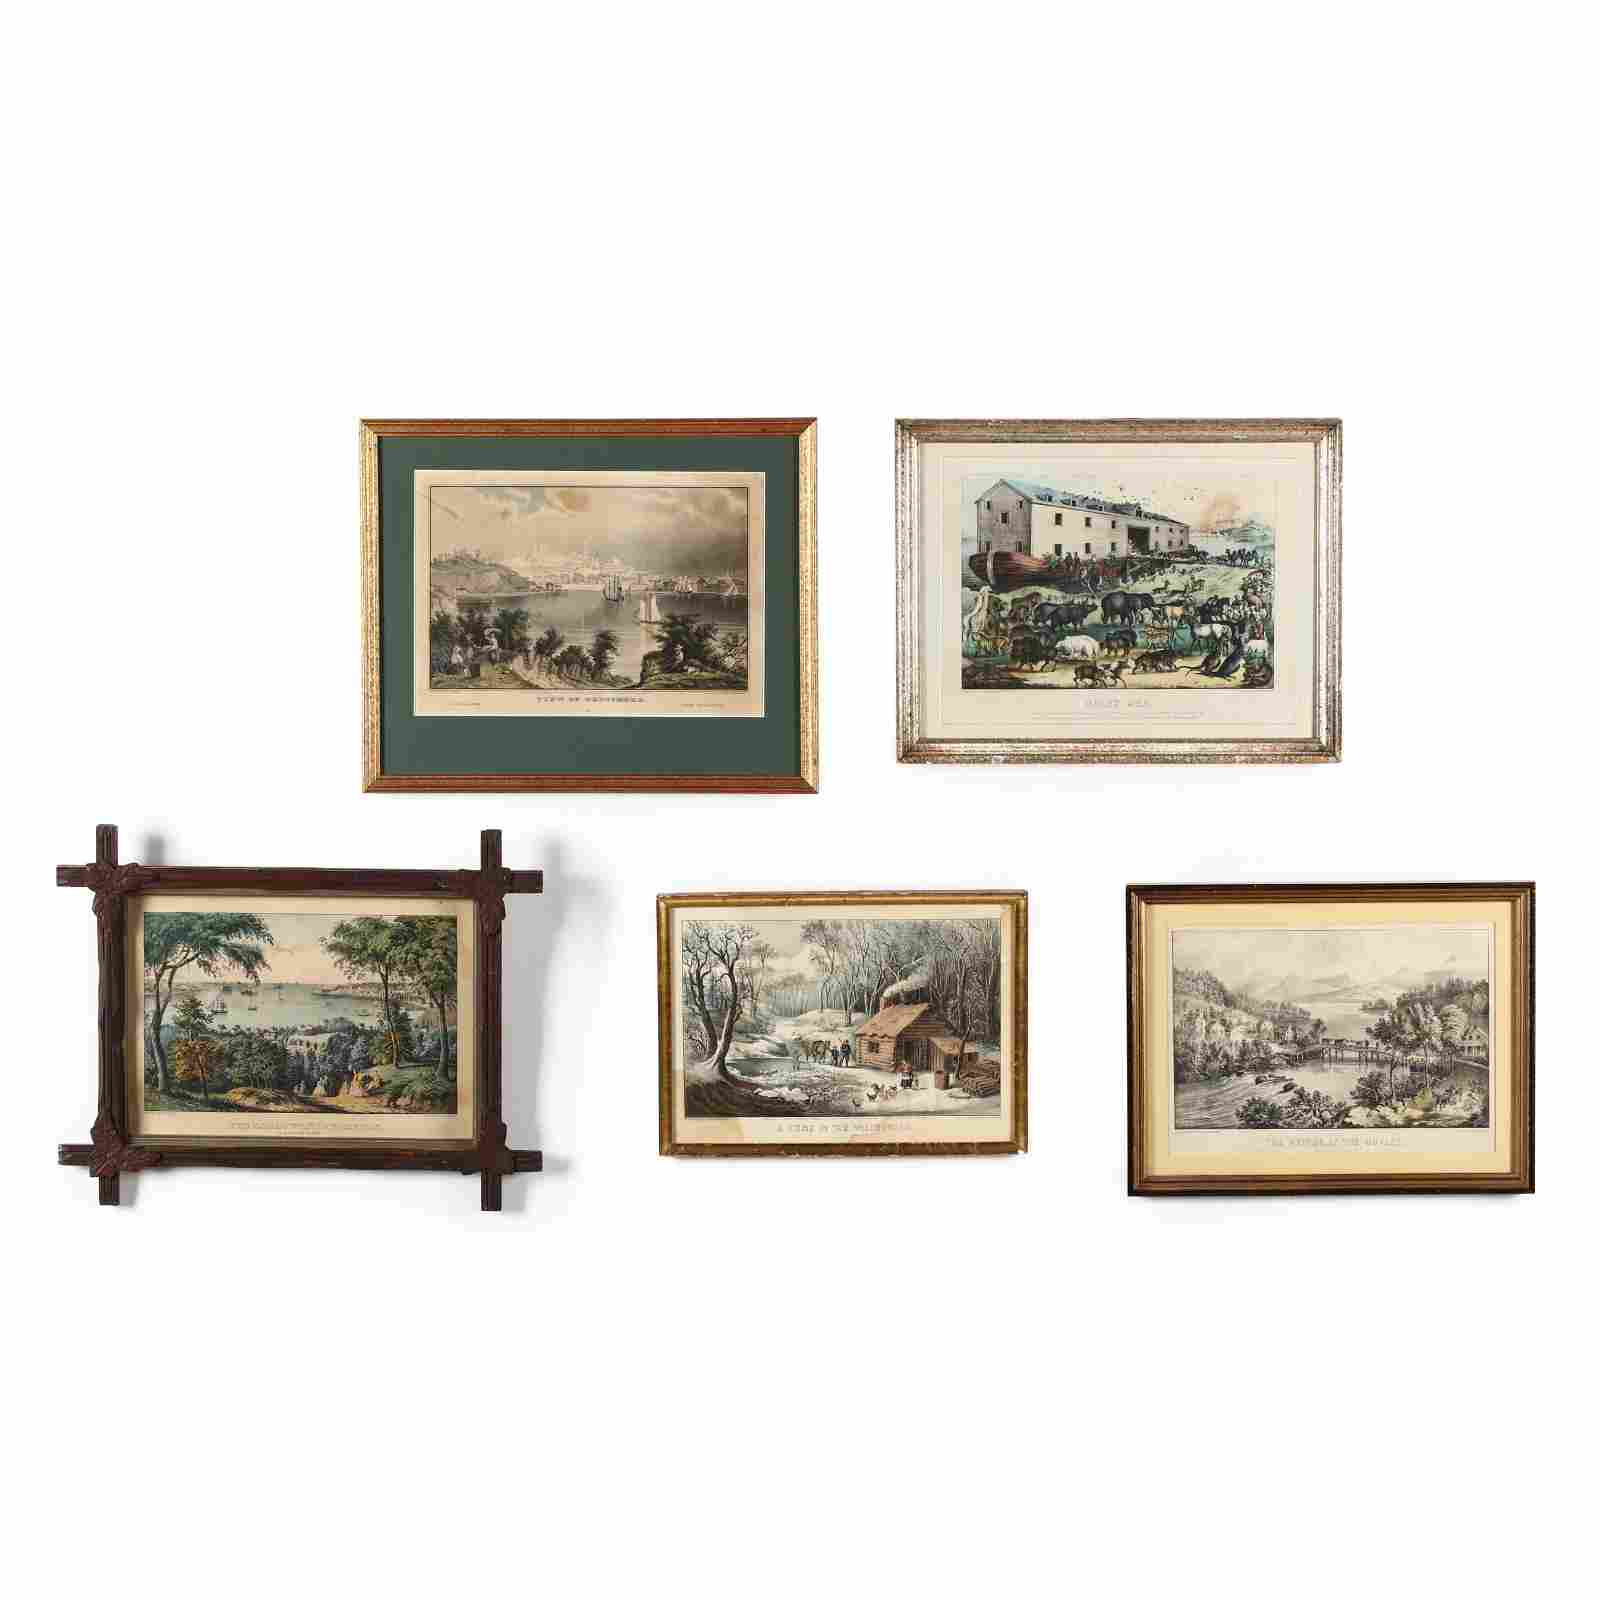 Five Landscape Currier & Ives Prints